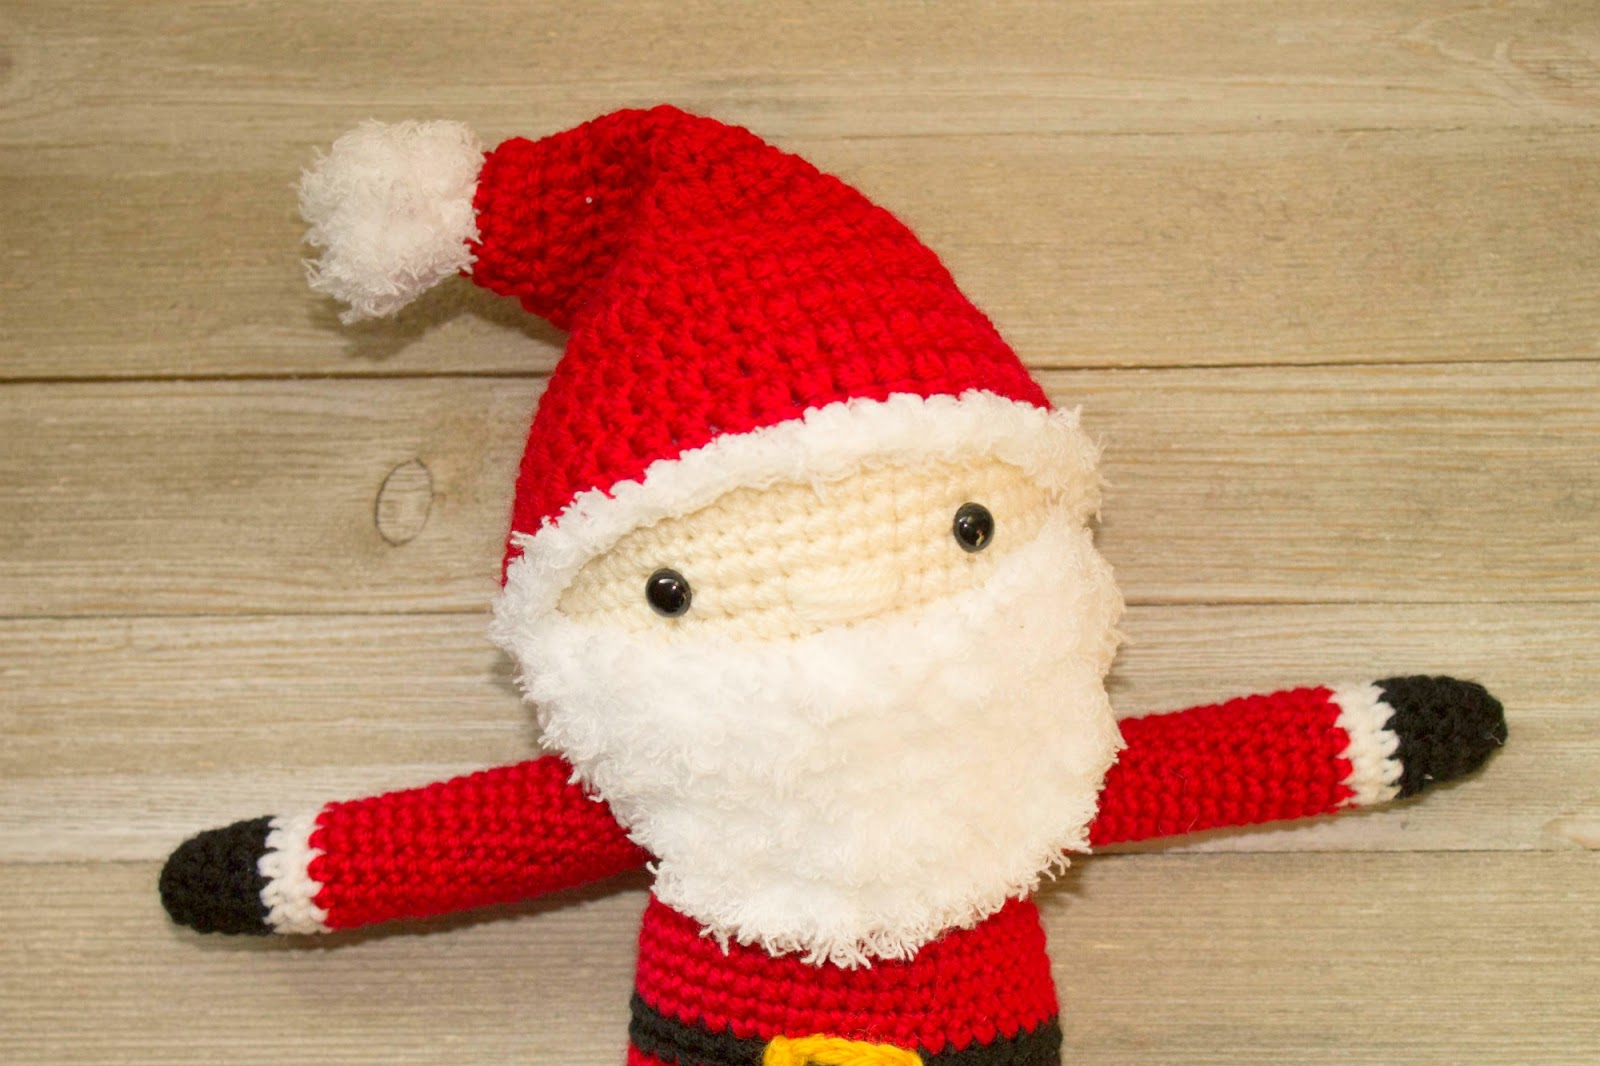 santa hat chair back covers hobby lobby big joe chairs bed bath and beyond free crochet pattern thefriendlyredfox